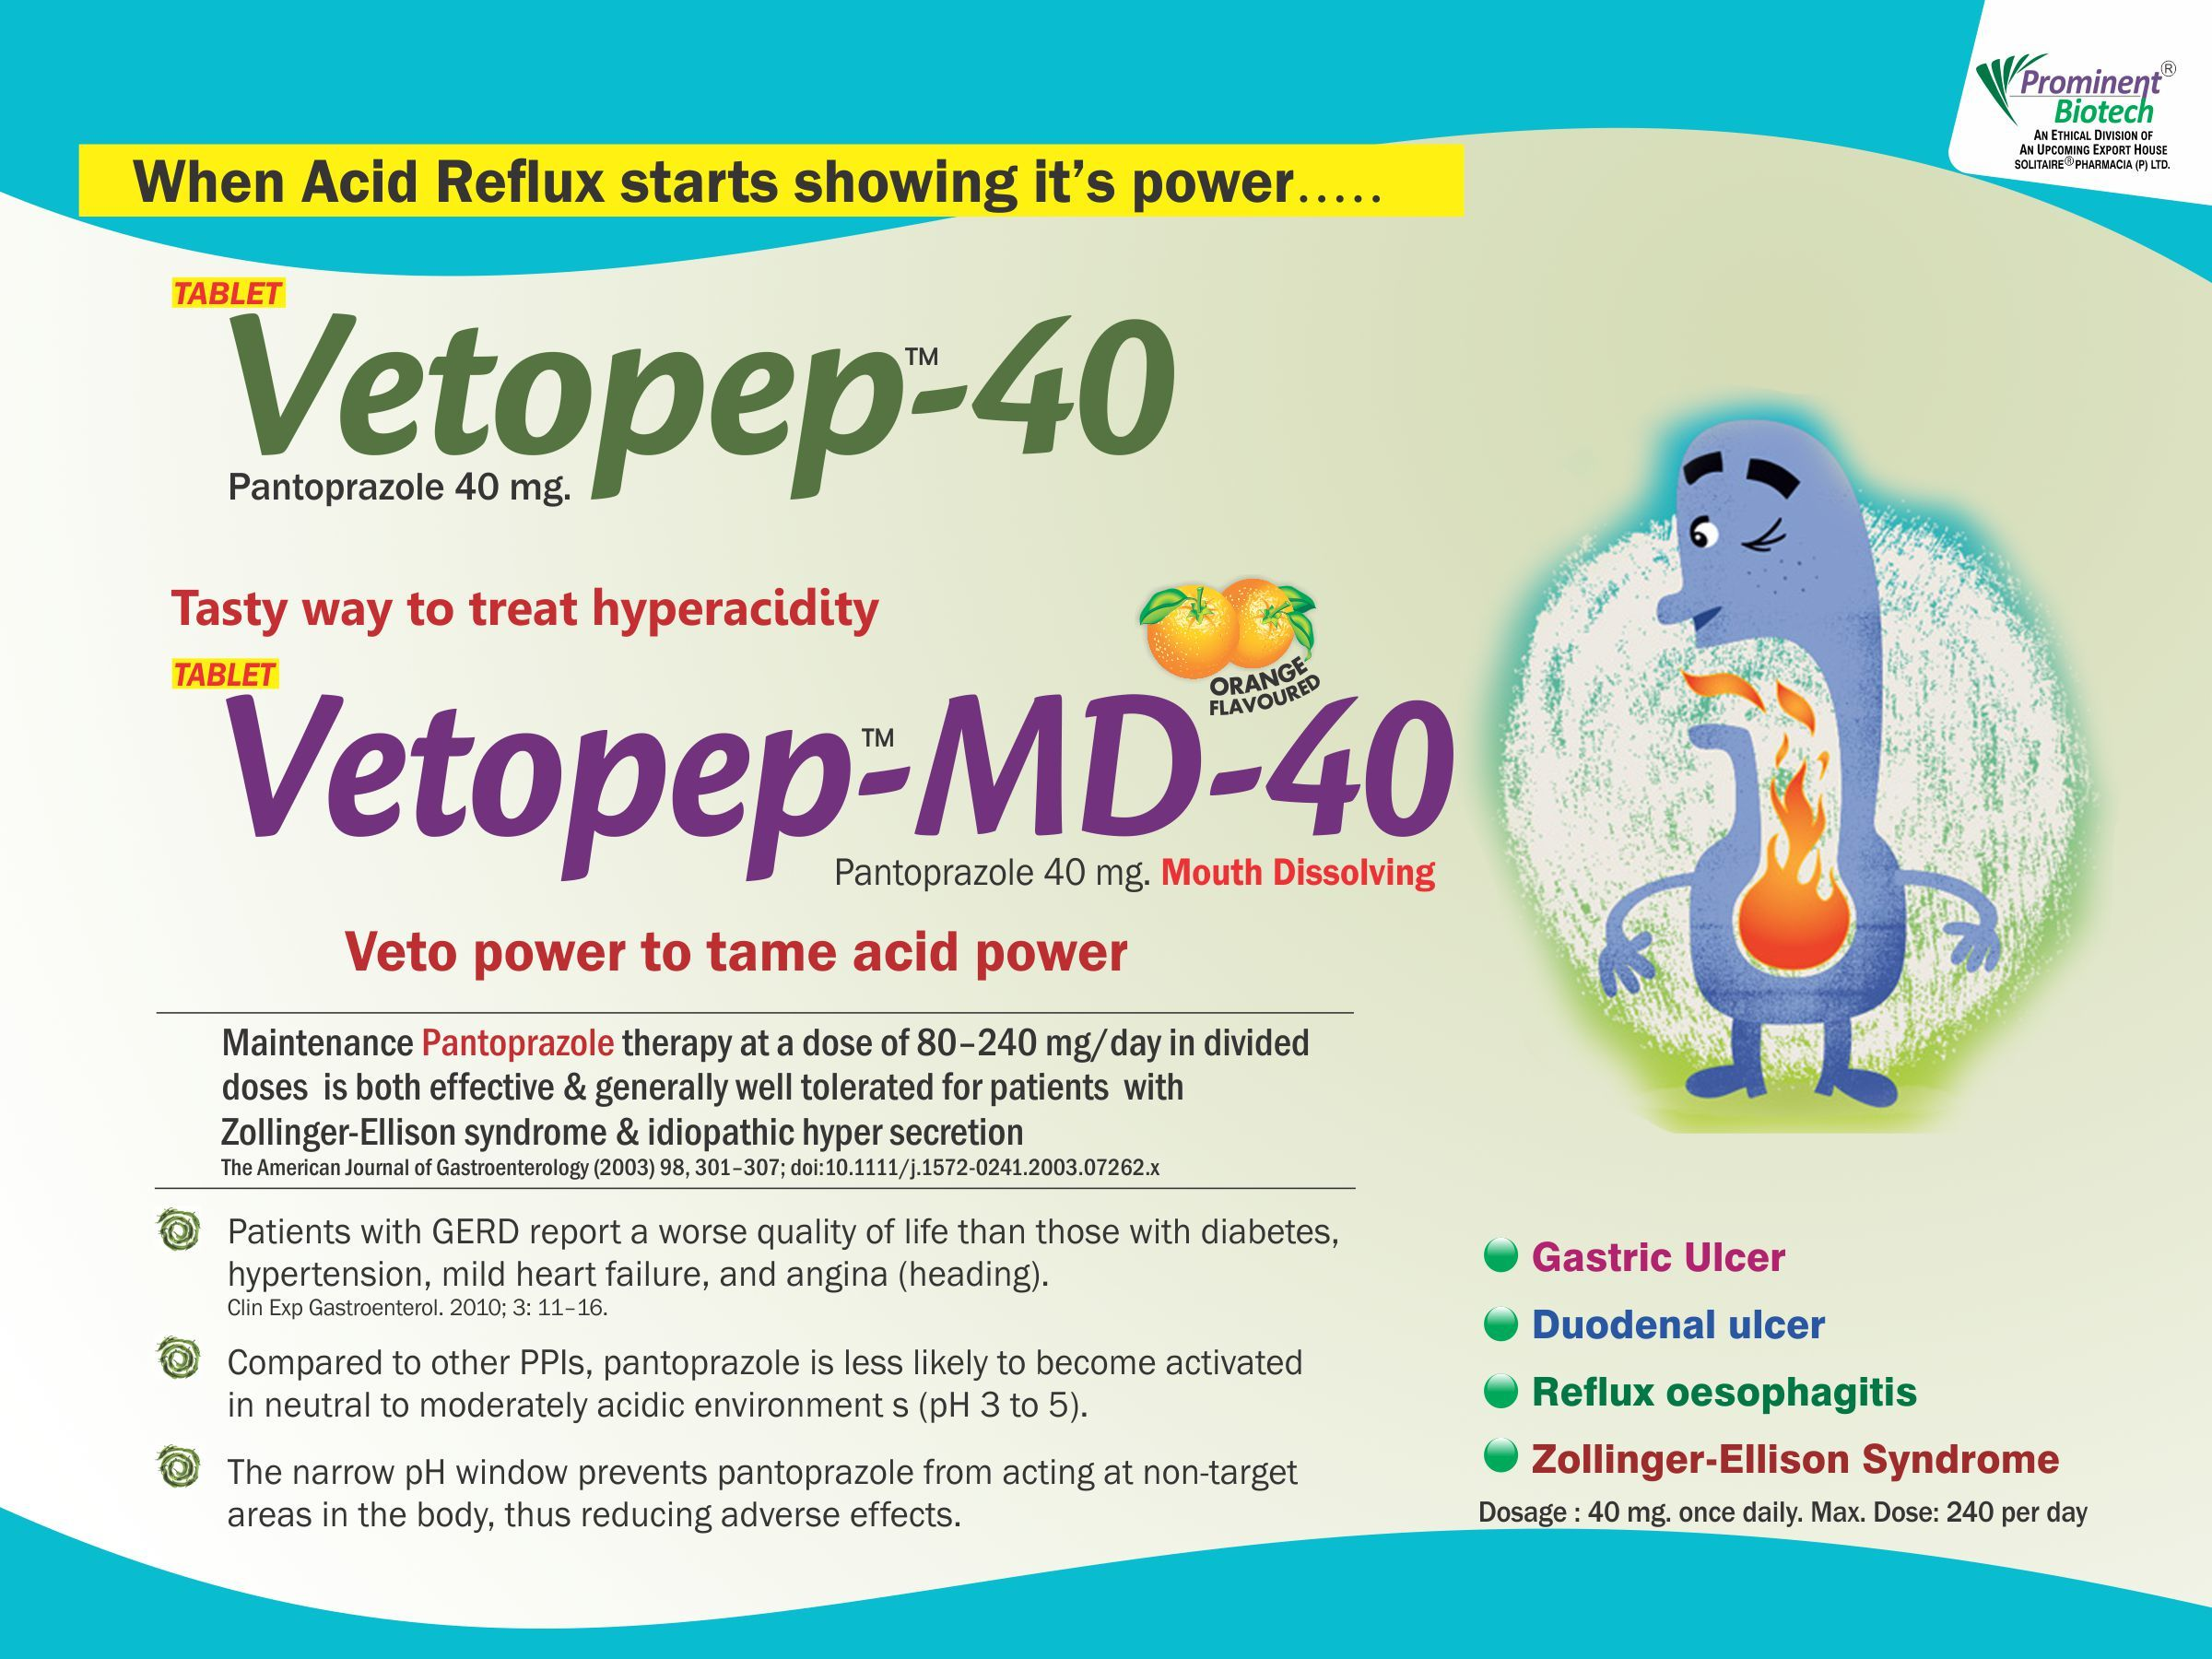 Pantoprazole 40 mg & 40 mg (Mouth Dissolving)